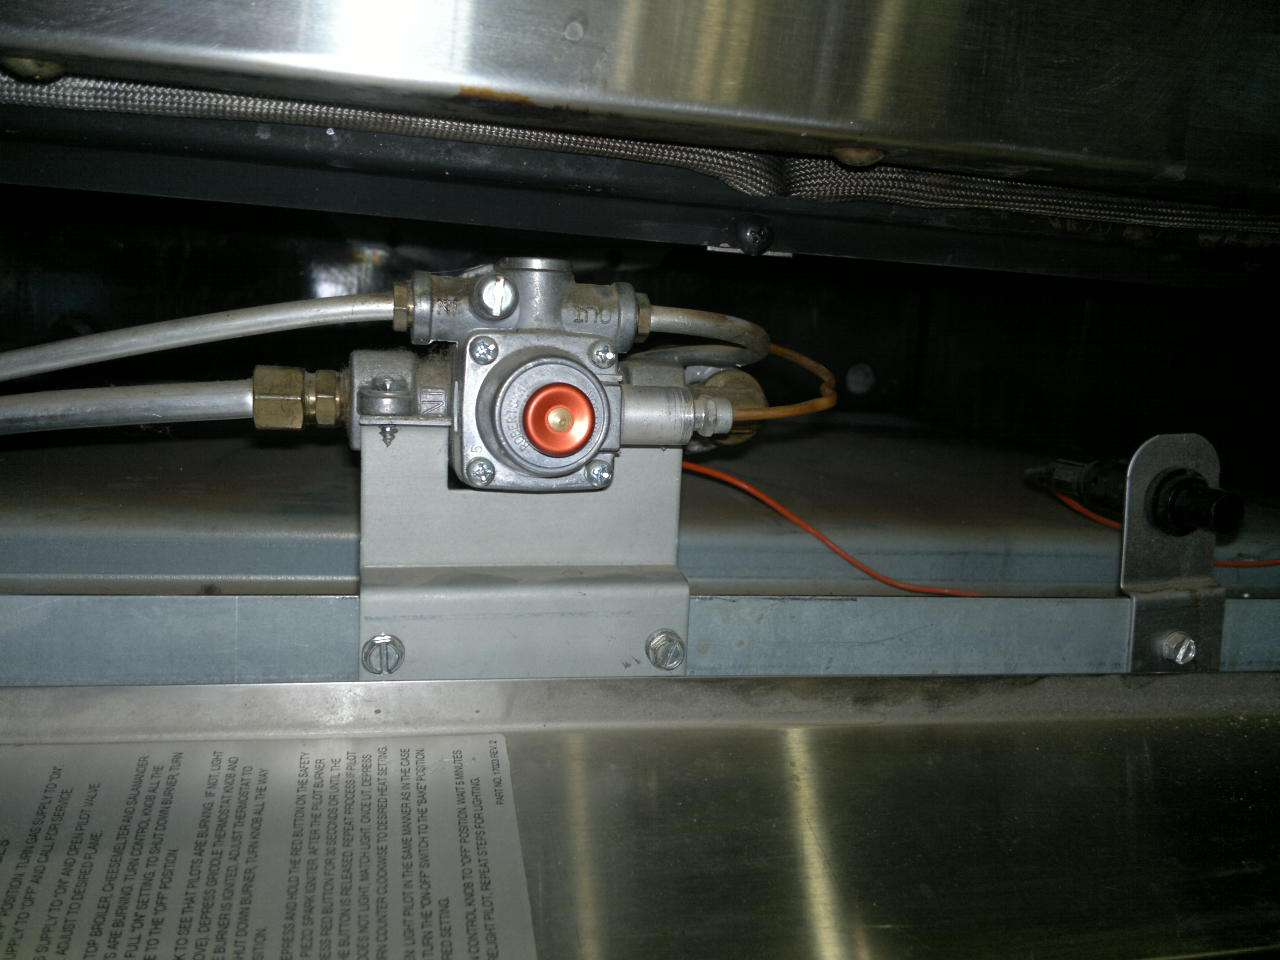 Dcs Oven Wiring Diagram | Wiring Liry Dc S Range Wiring Diagram on